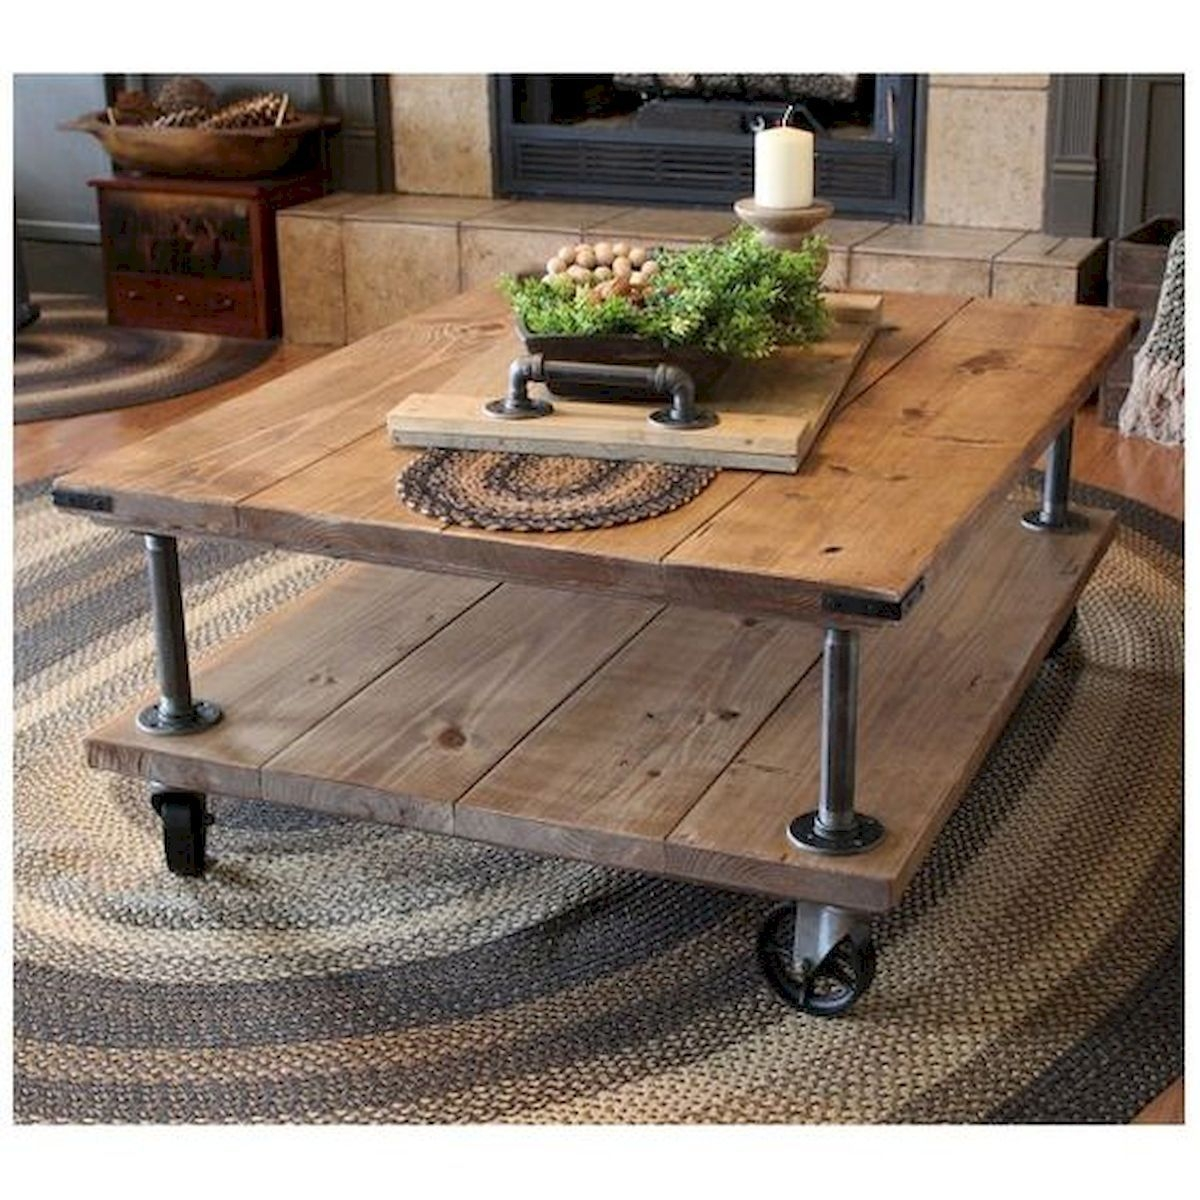 Fantastic Diy Projects Mini Pallet Coffee Table Design Ideas11